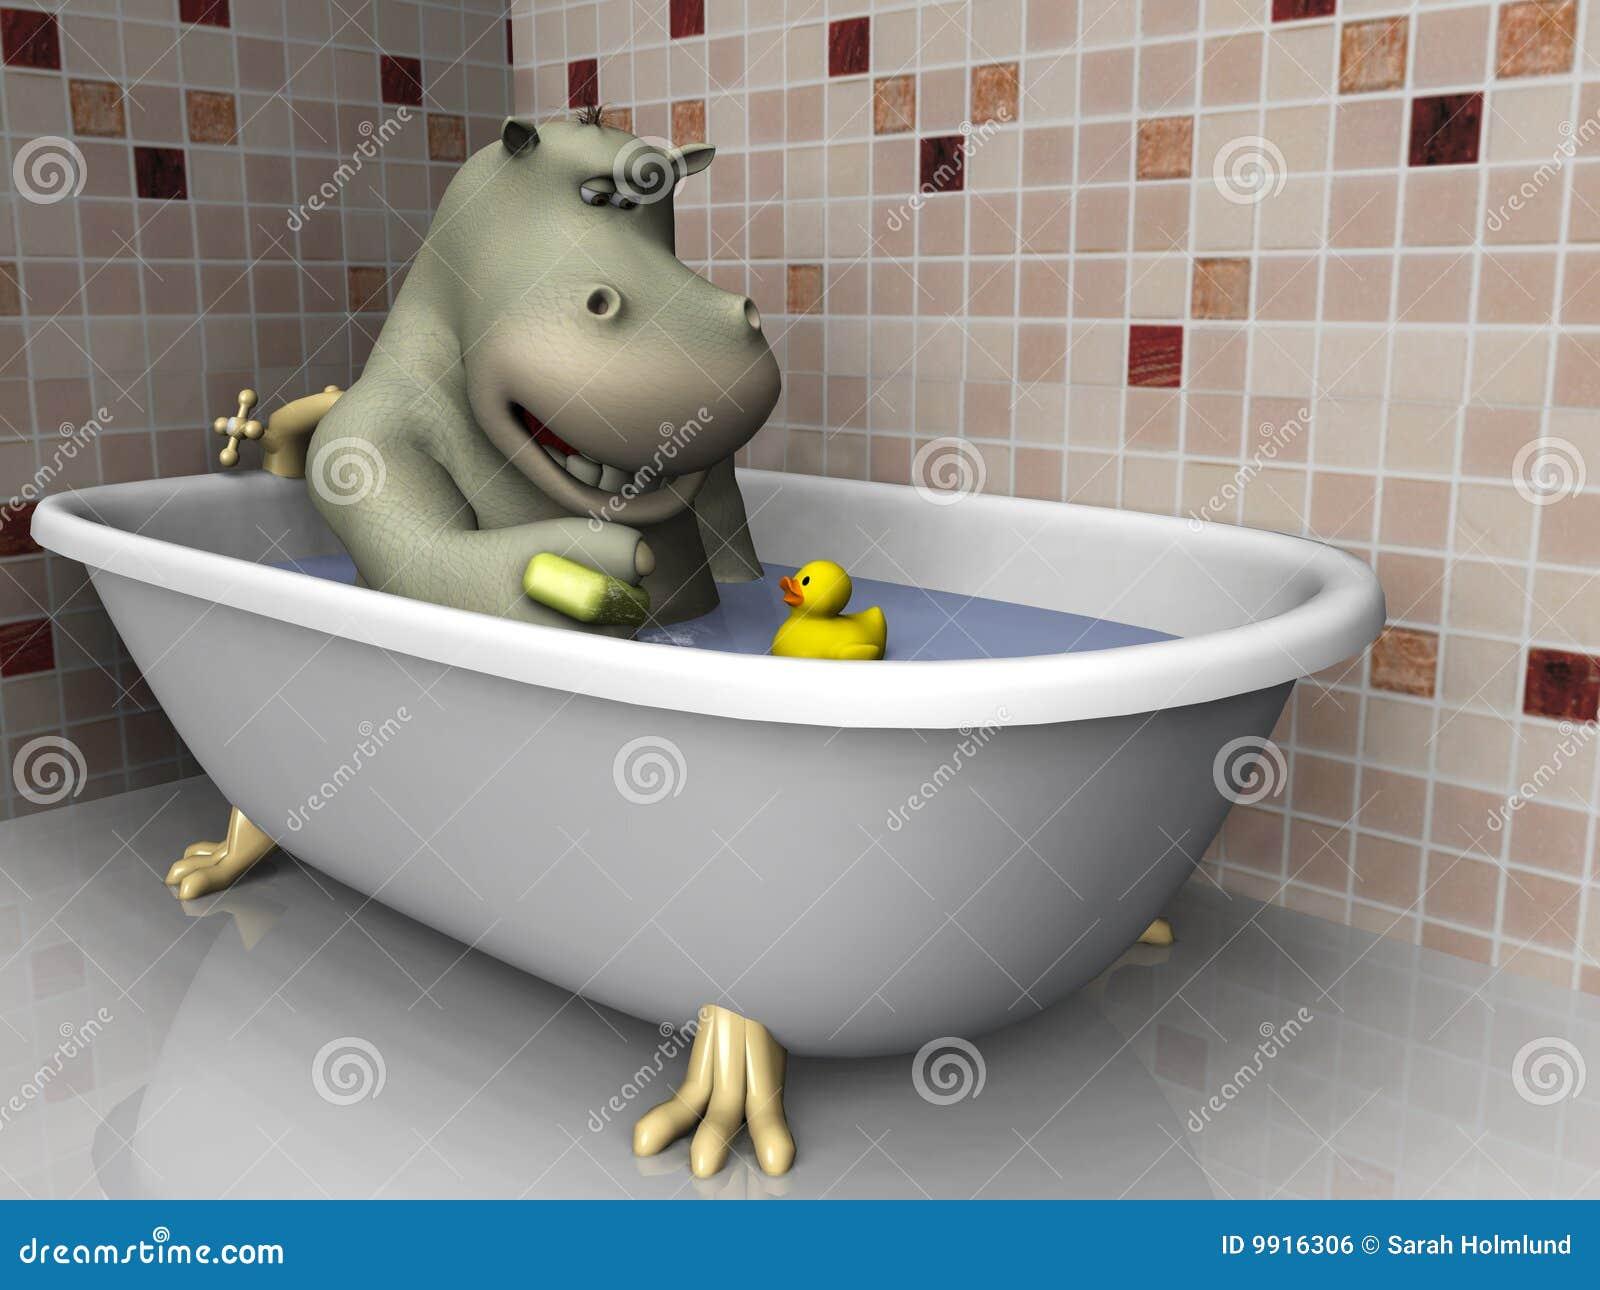 Beautiful Cartoon Hippo In Bathtub. Stock Illustration. Illustration Of Rubber    9916306